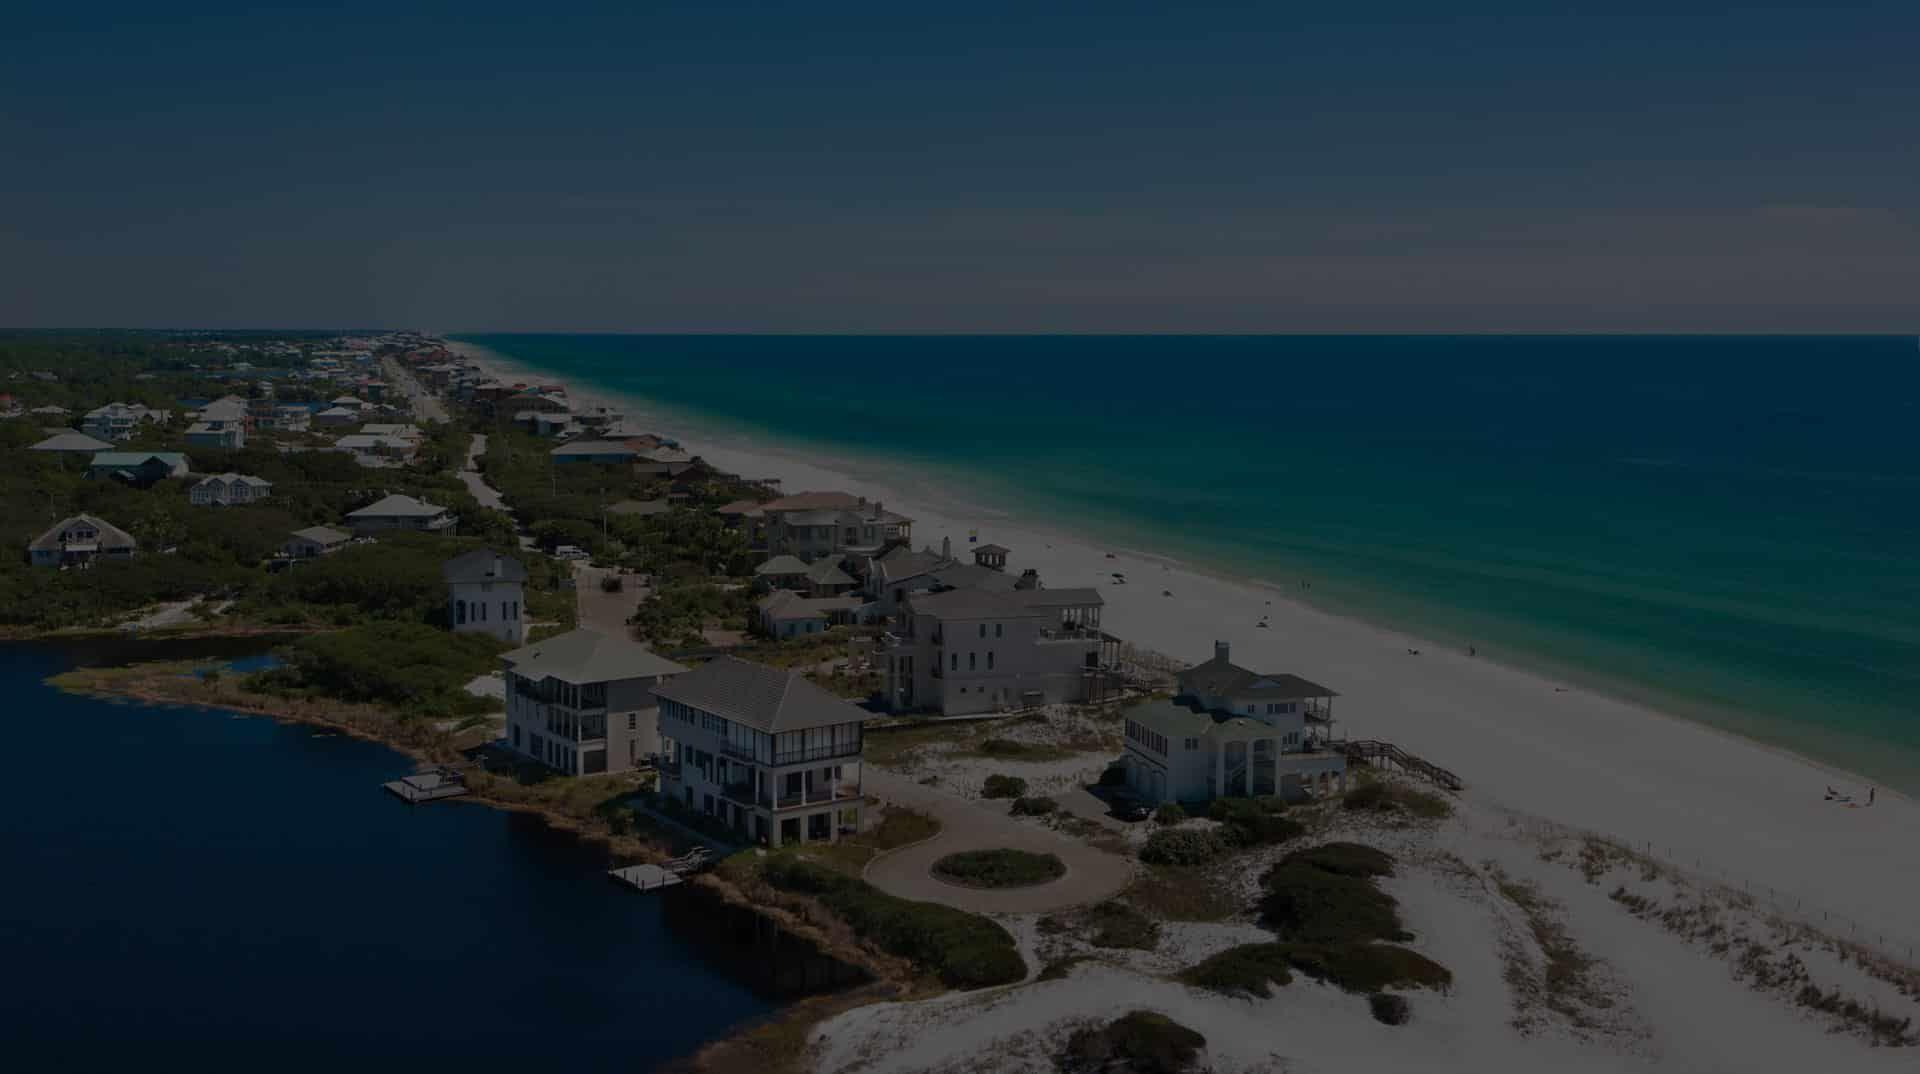 seaside mortgage, seaside fl mortgage, seaside florida mortgage, seaside fl mortgage rates, seaside fl mortgage broker, seaside fl mortgage calculator, mortgage broker near me,